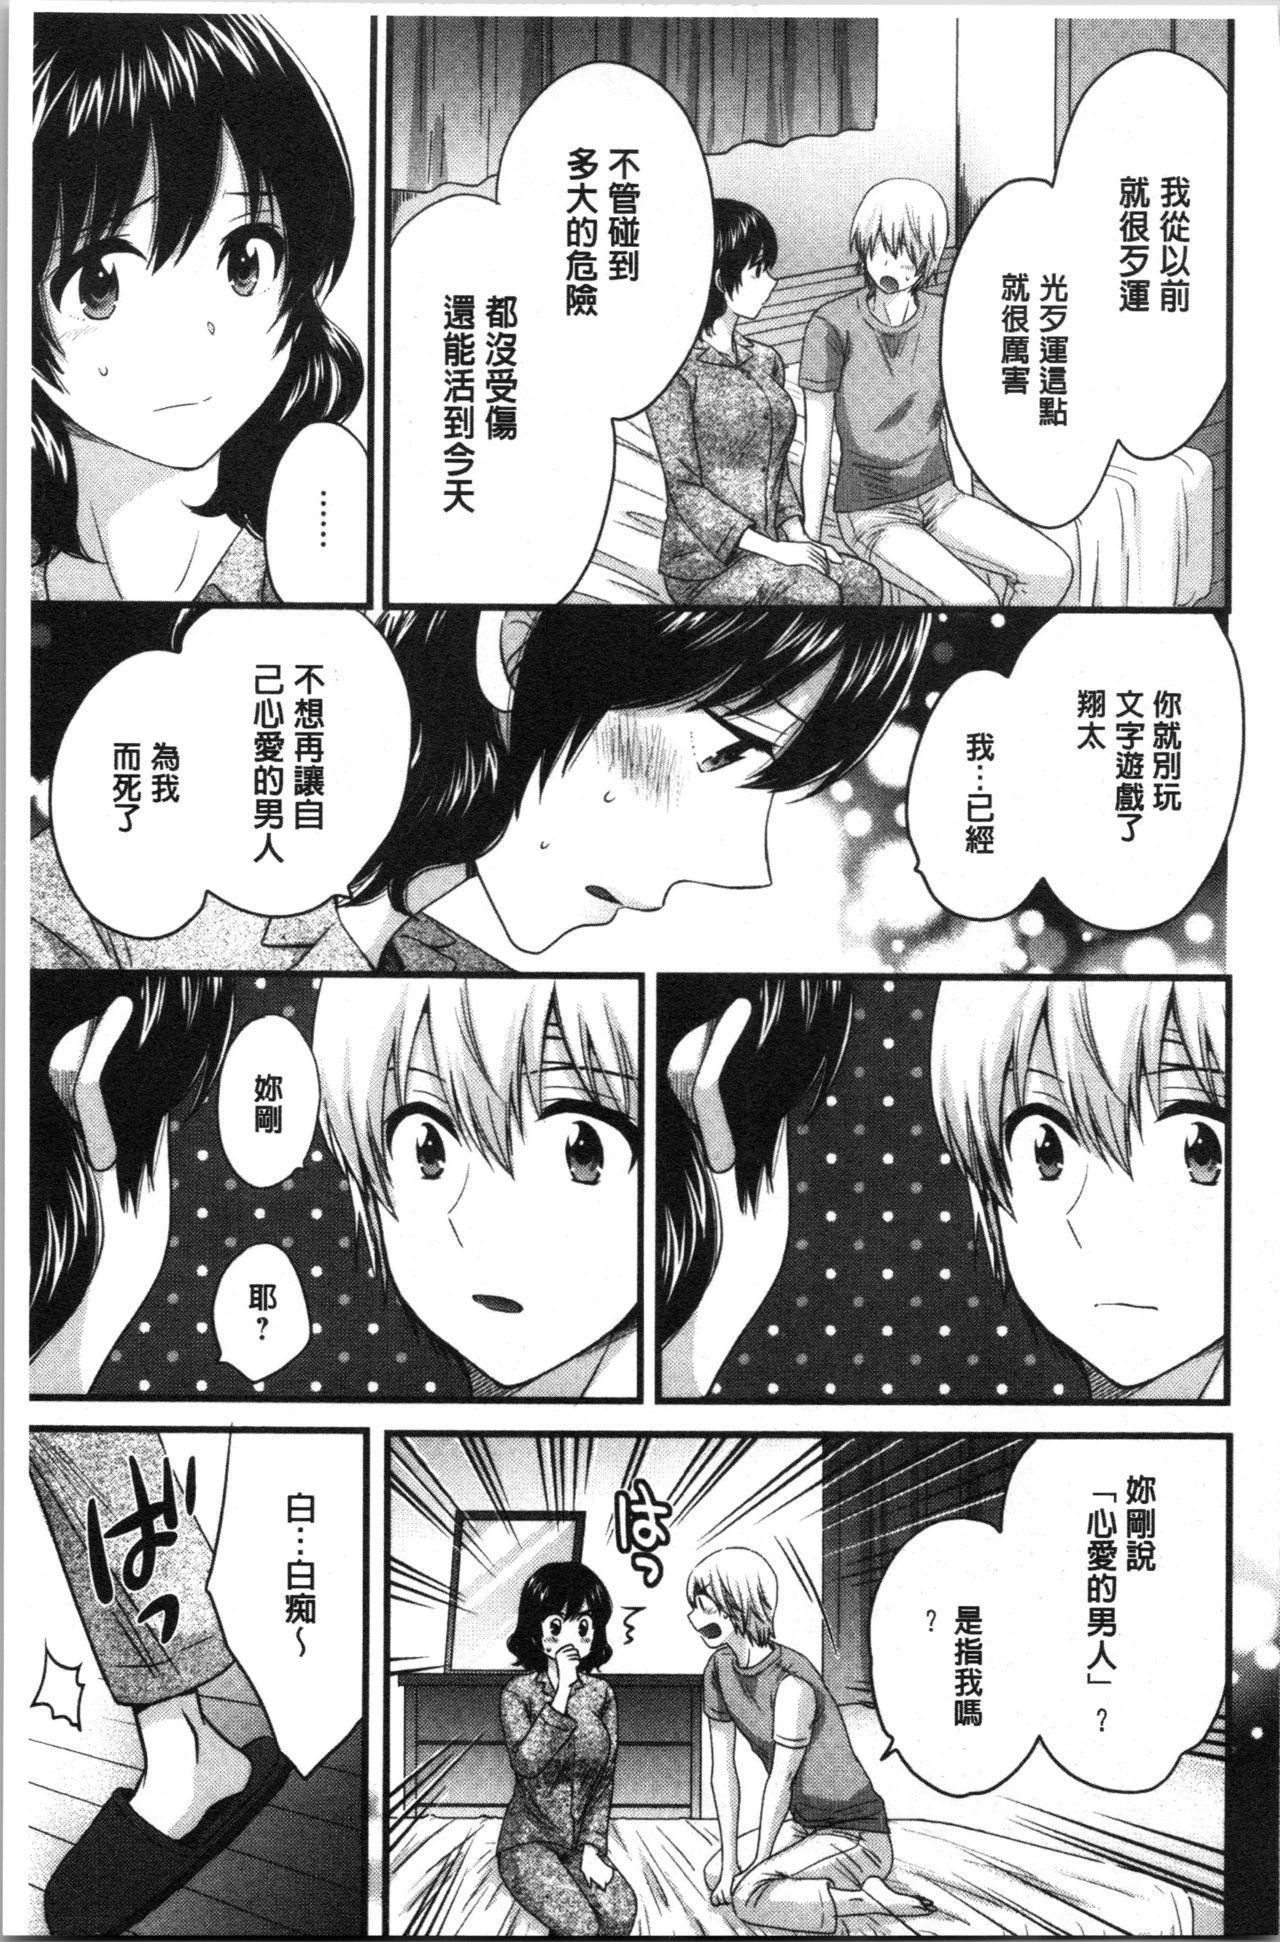 Ottori Midarana Mikami-san   嫻淑優雅又淫亂的三上小姐 140